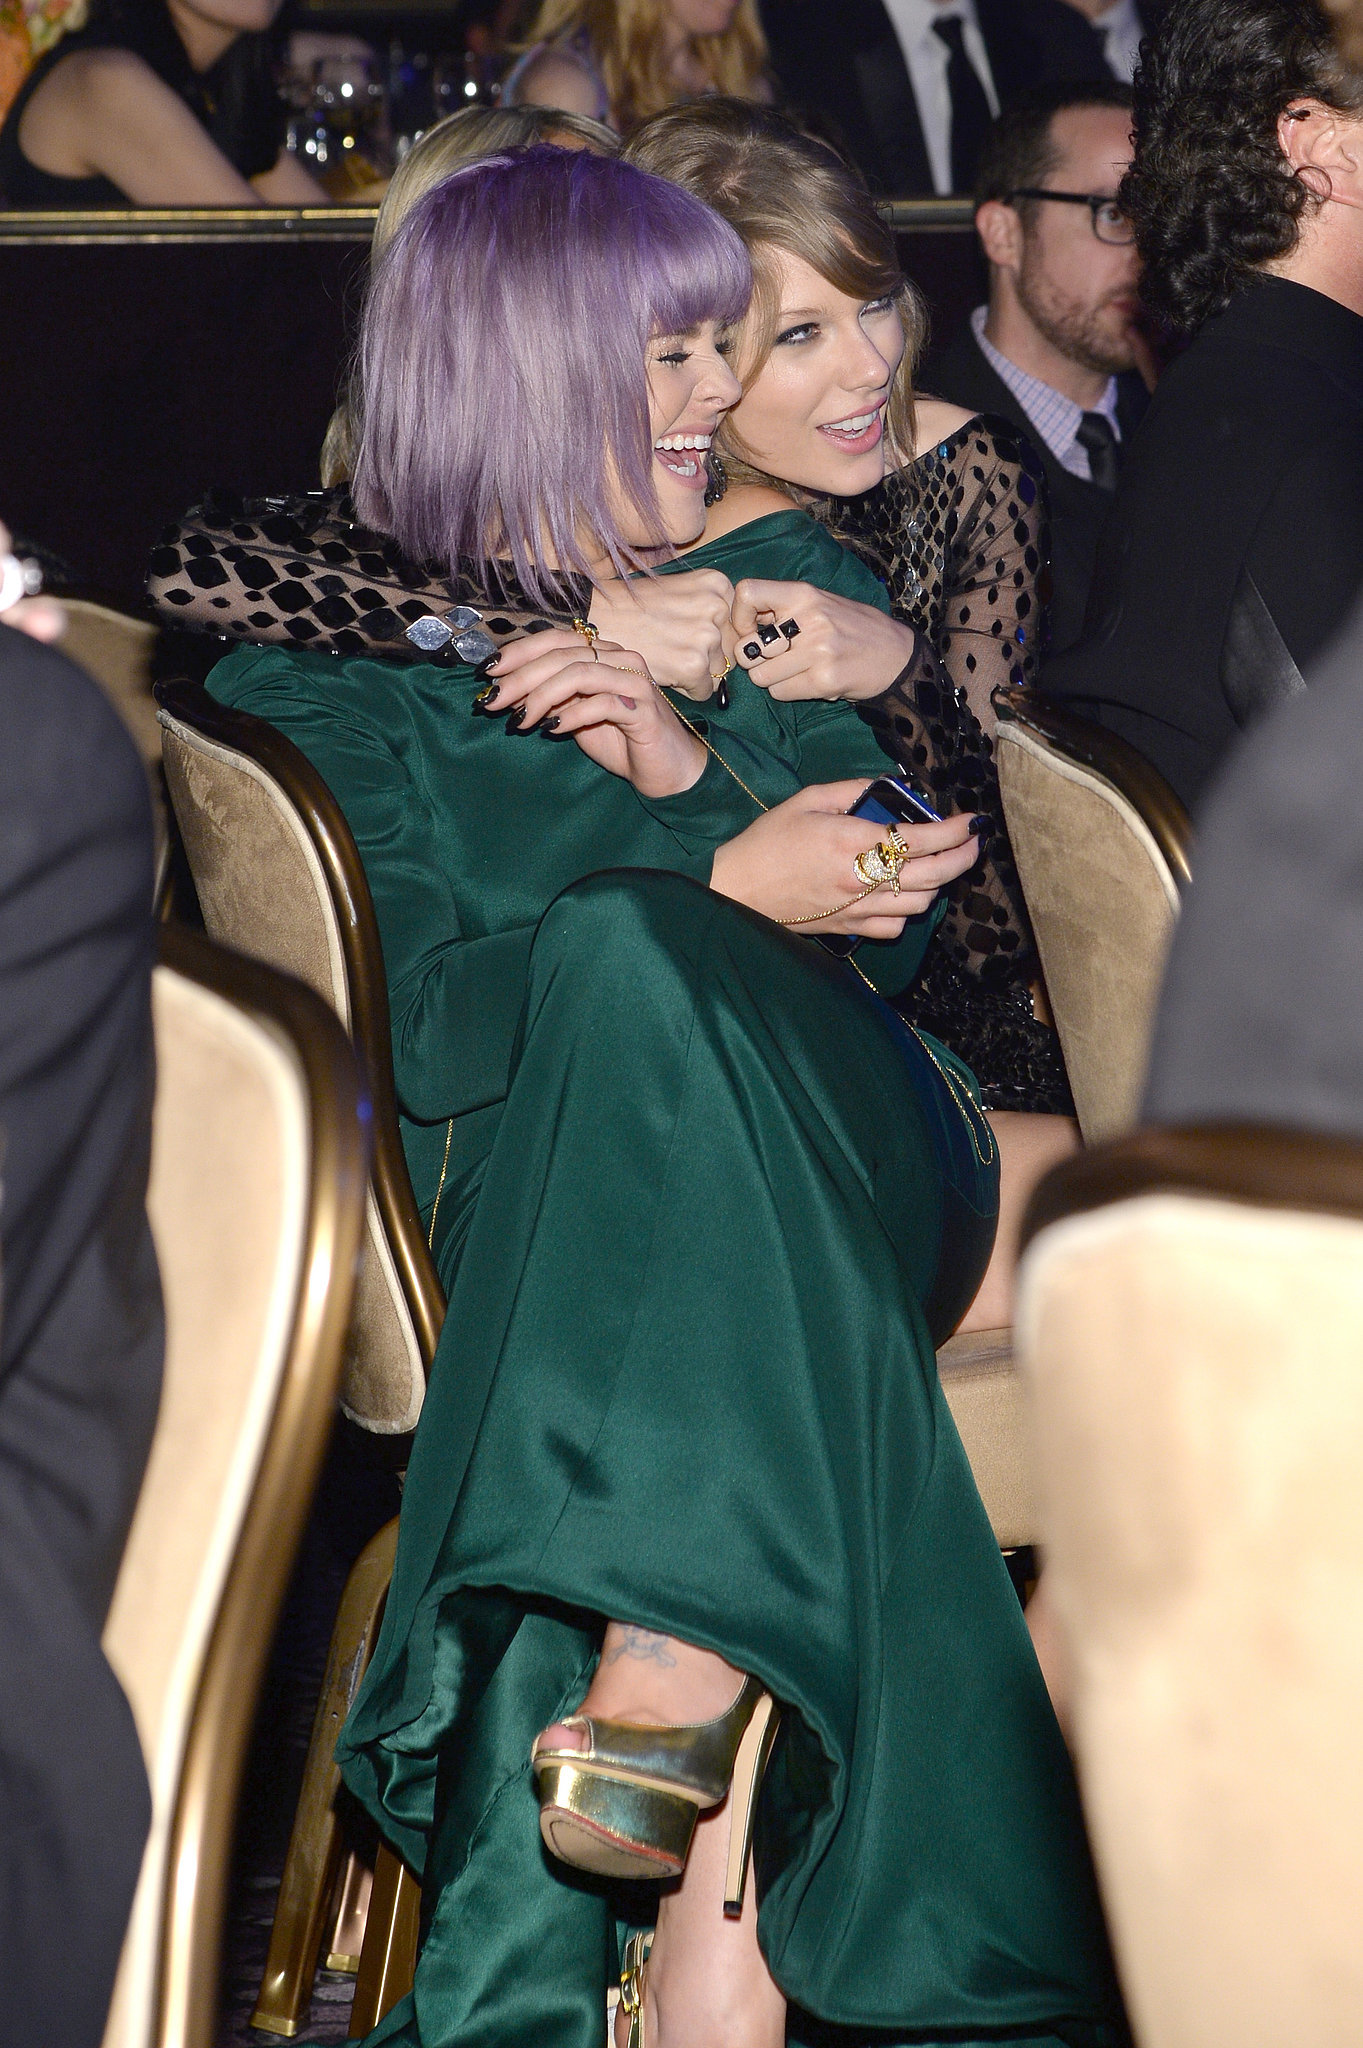 Kelly Osbourne and Taylor Swift goofed around.